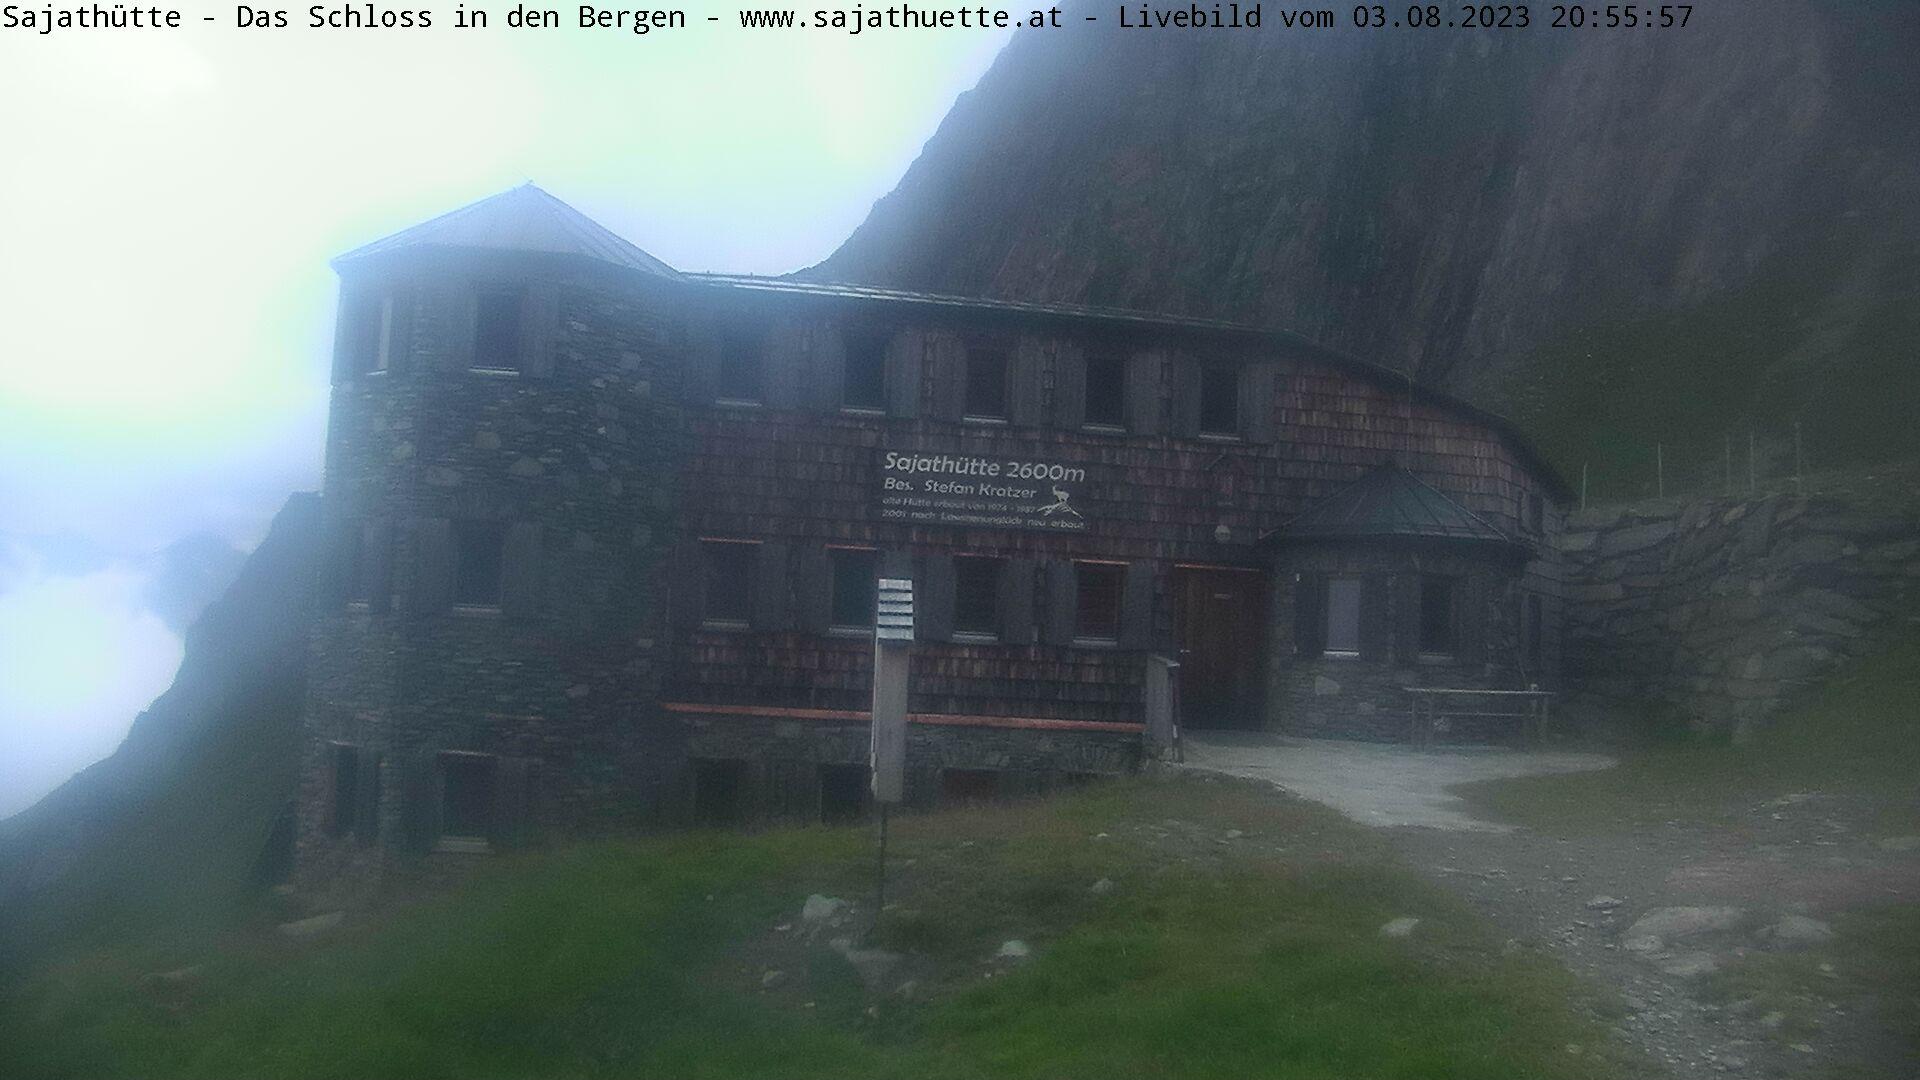 Webcam Webcam Sajathütte | Aktuelles Live-Bild aus 2.600m Seehöhe